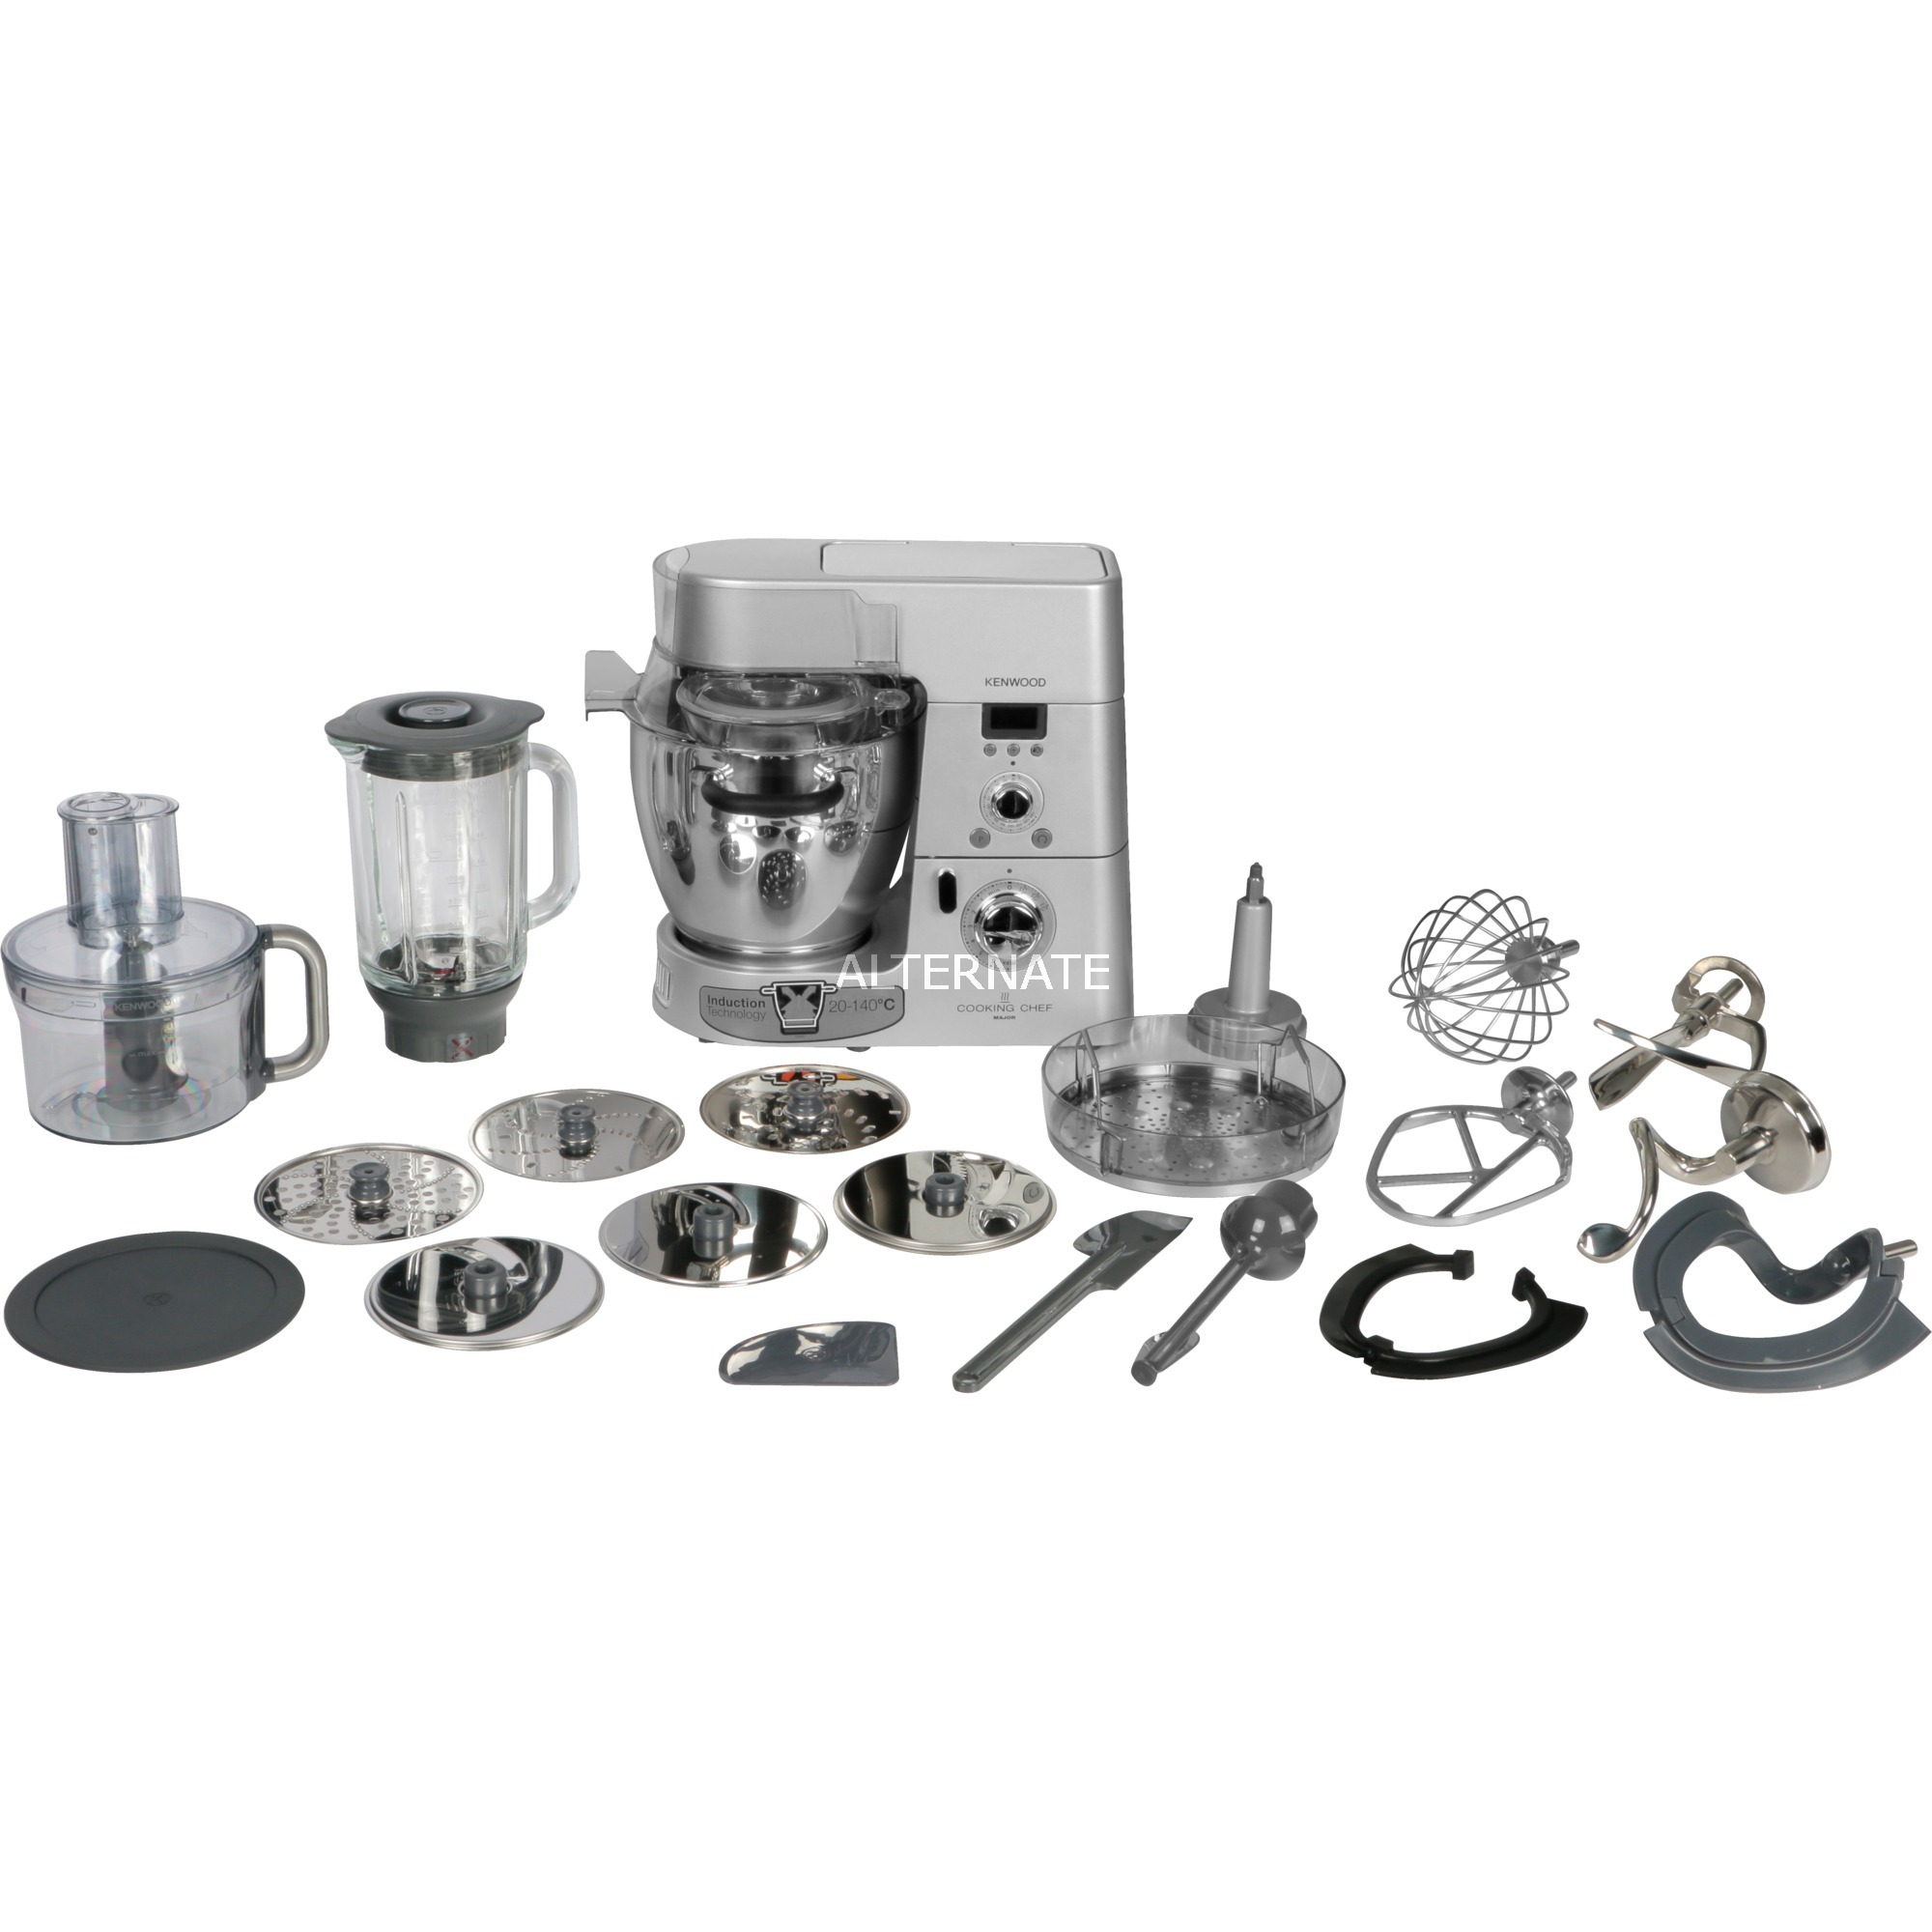 KM096, Robot de cuisine